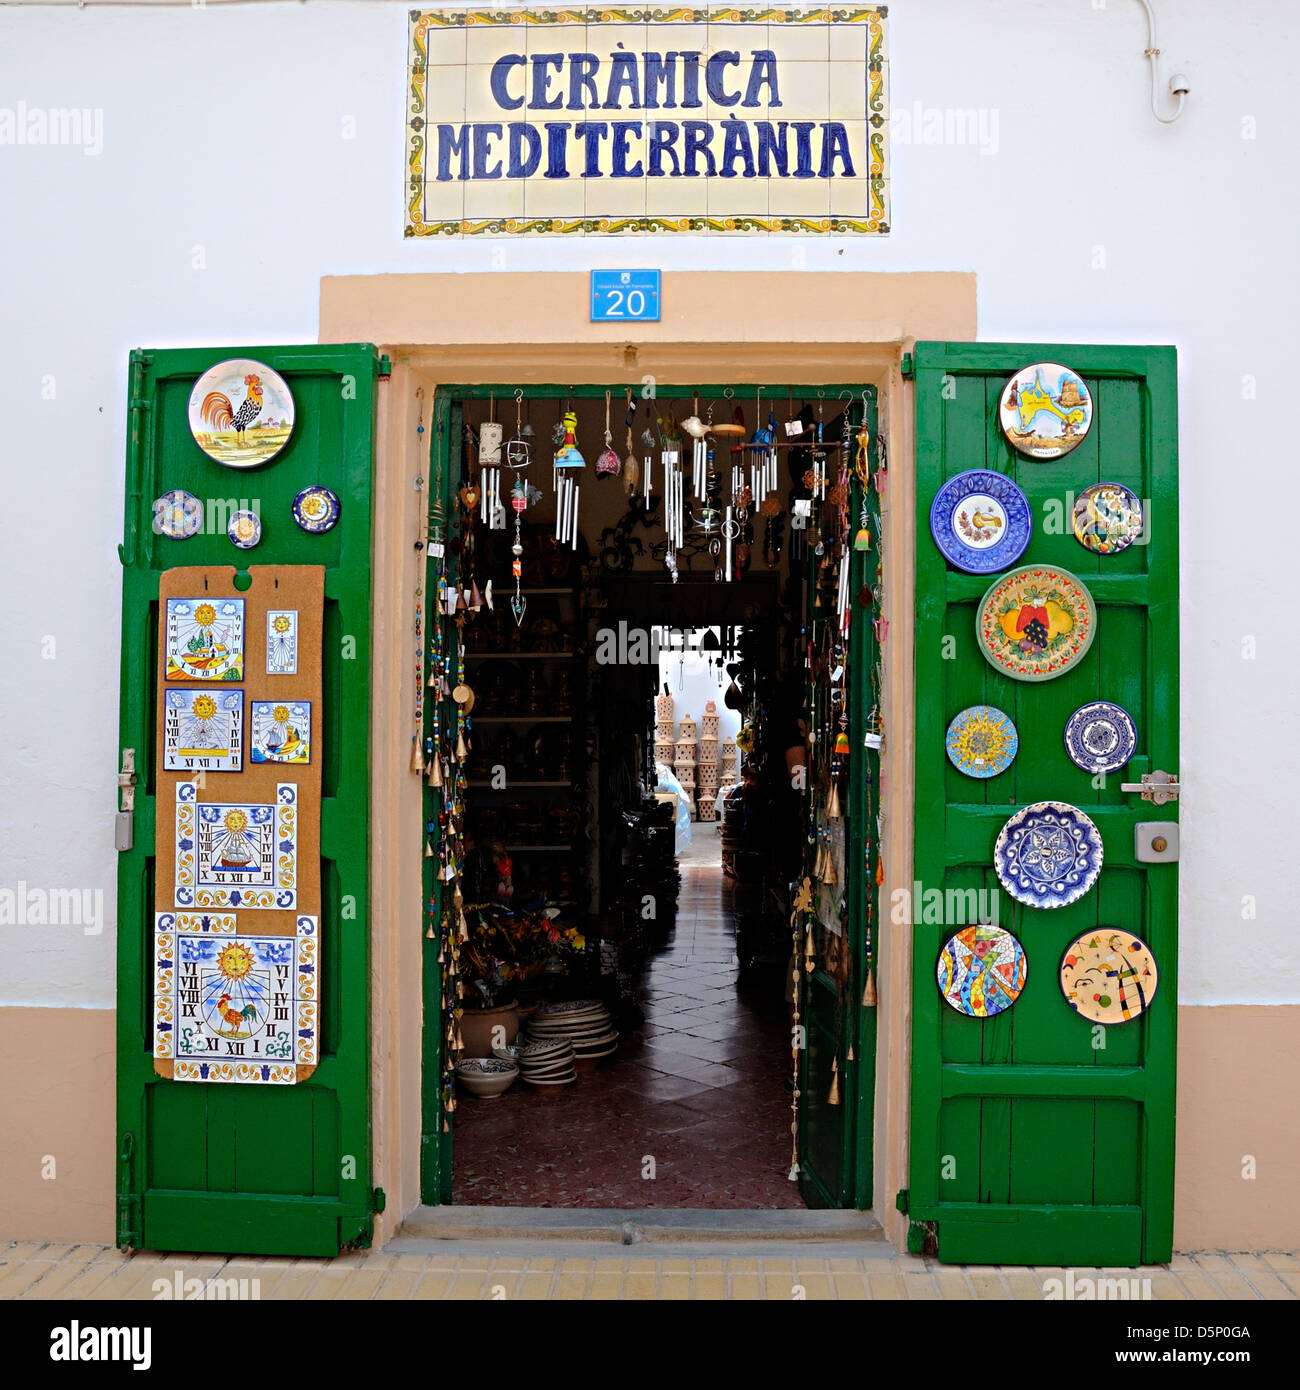 Mediterranian pottery shop. Formentera, Balearic Islands, Spain - Stock Image